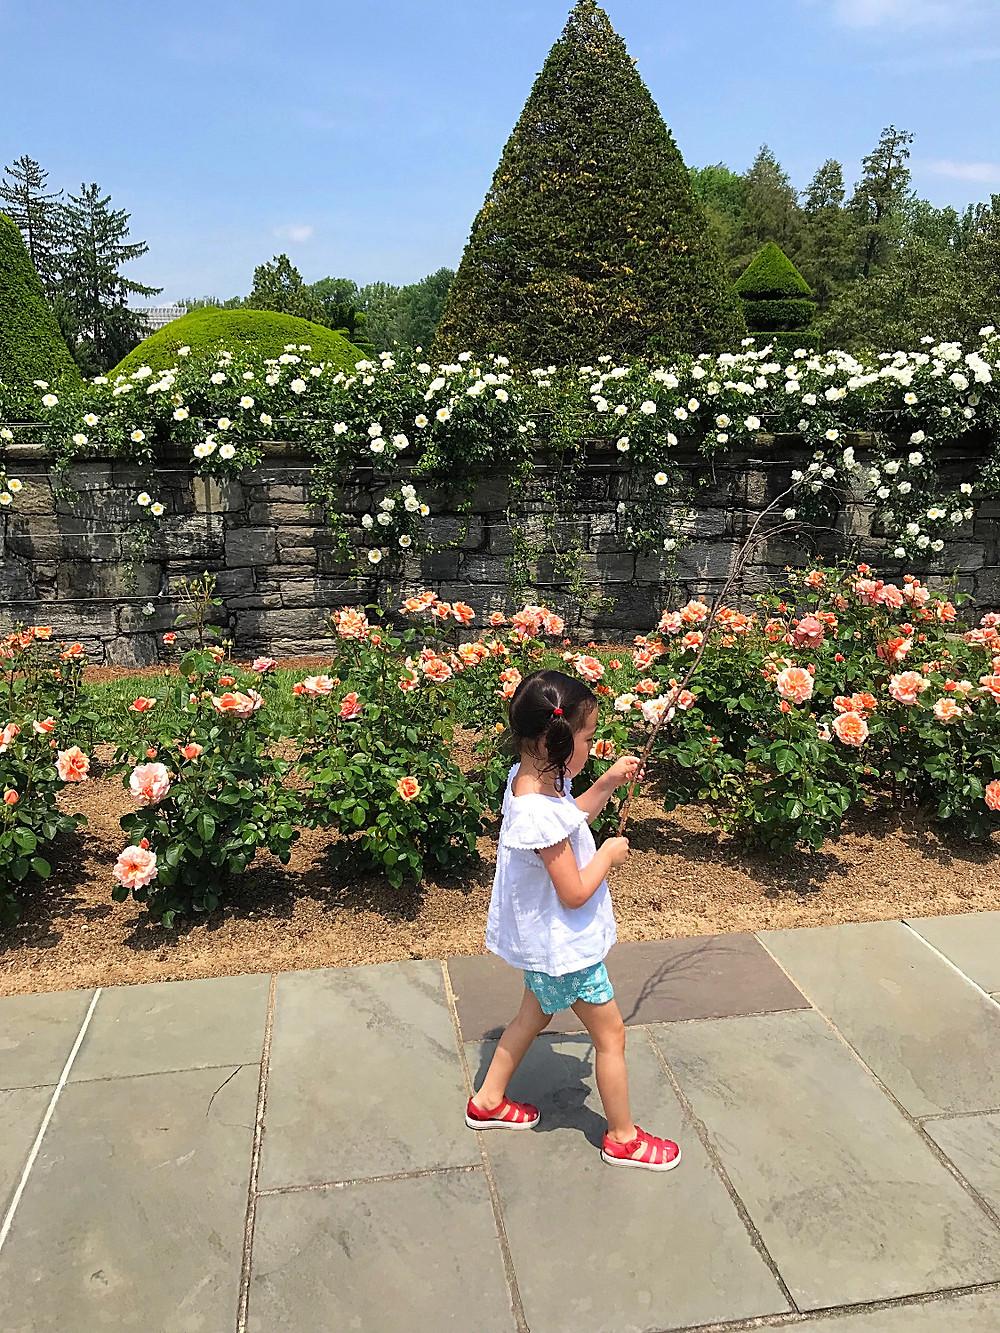 Curious G and Me, Longwood Gardens, topiary garden, children's garden, Philadelphia, Philadelphia gardens, Philadelphia with kids, rose gaden